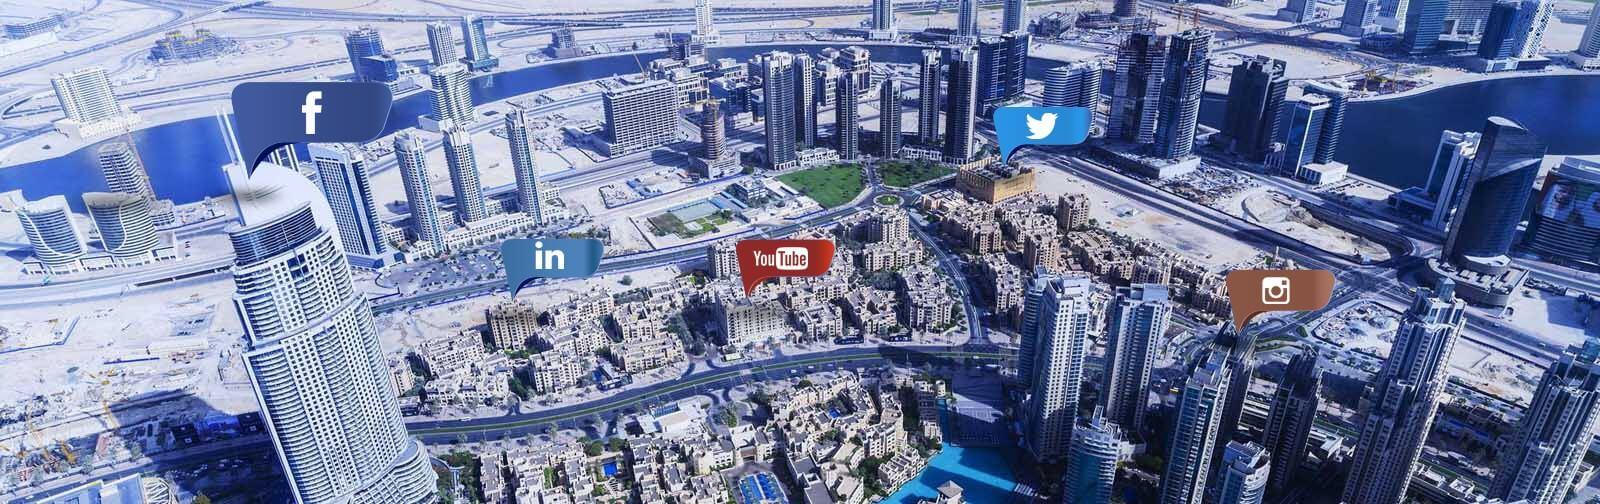 Social Media Marketing Dubai Agency (UAE Company)